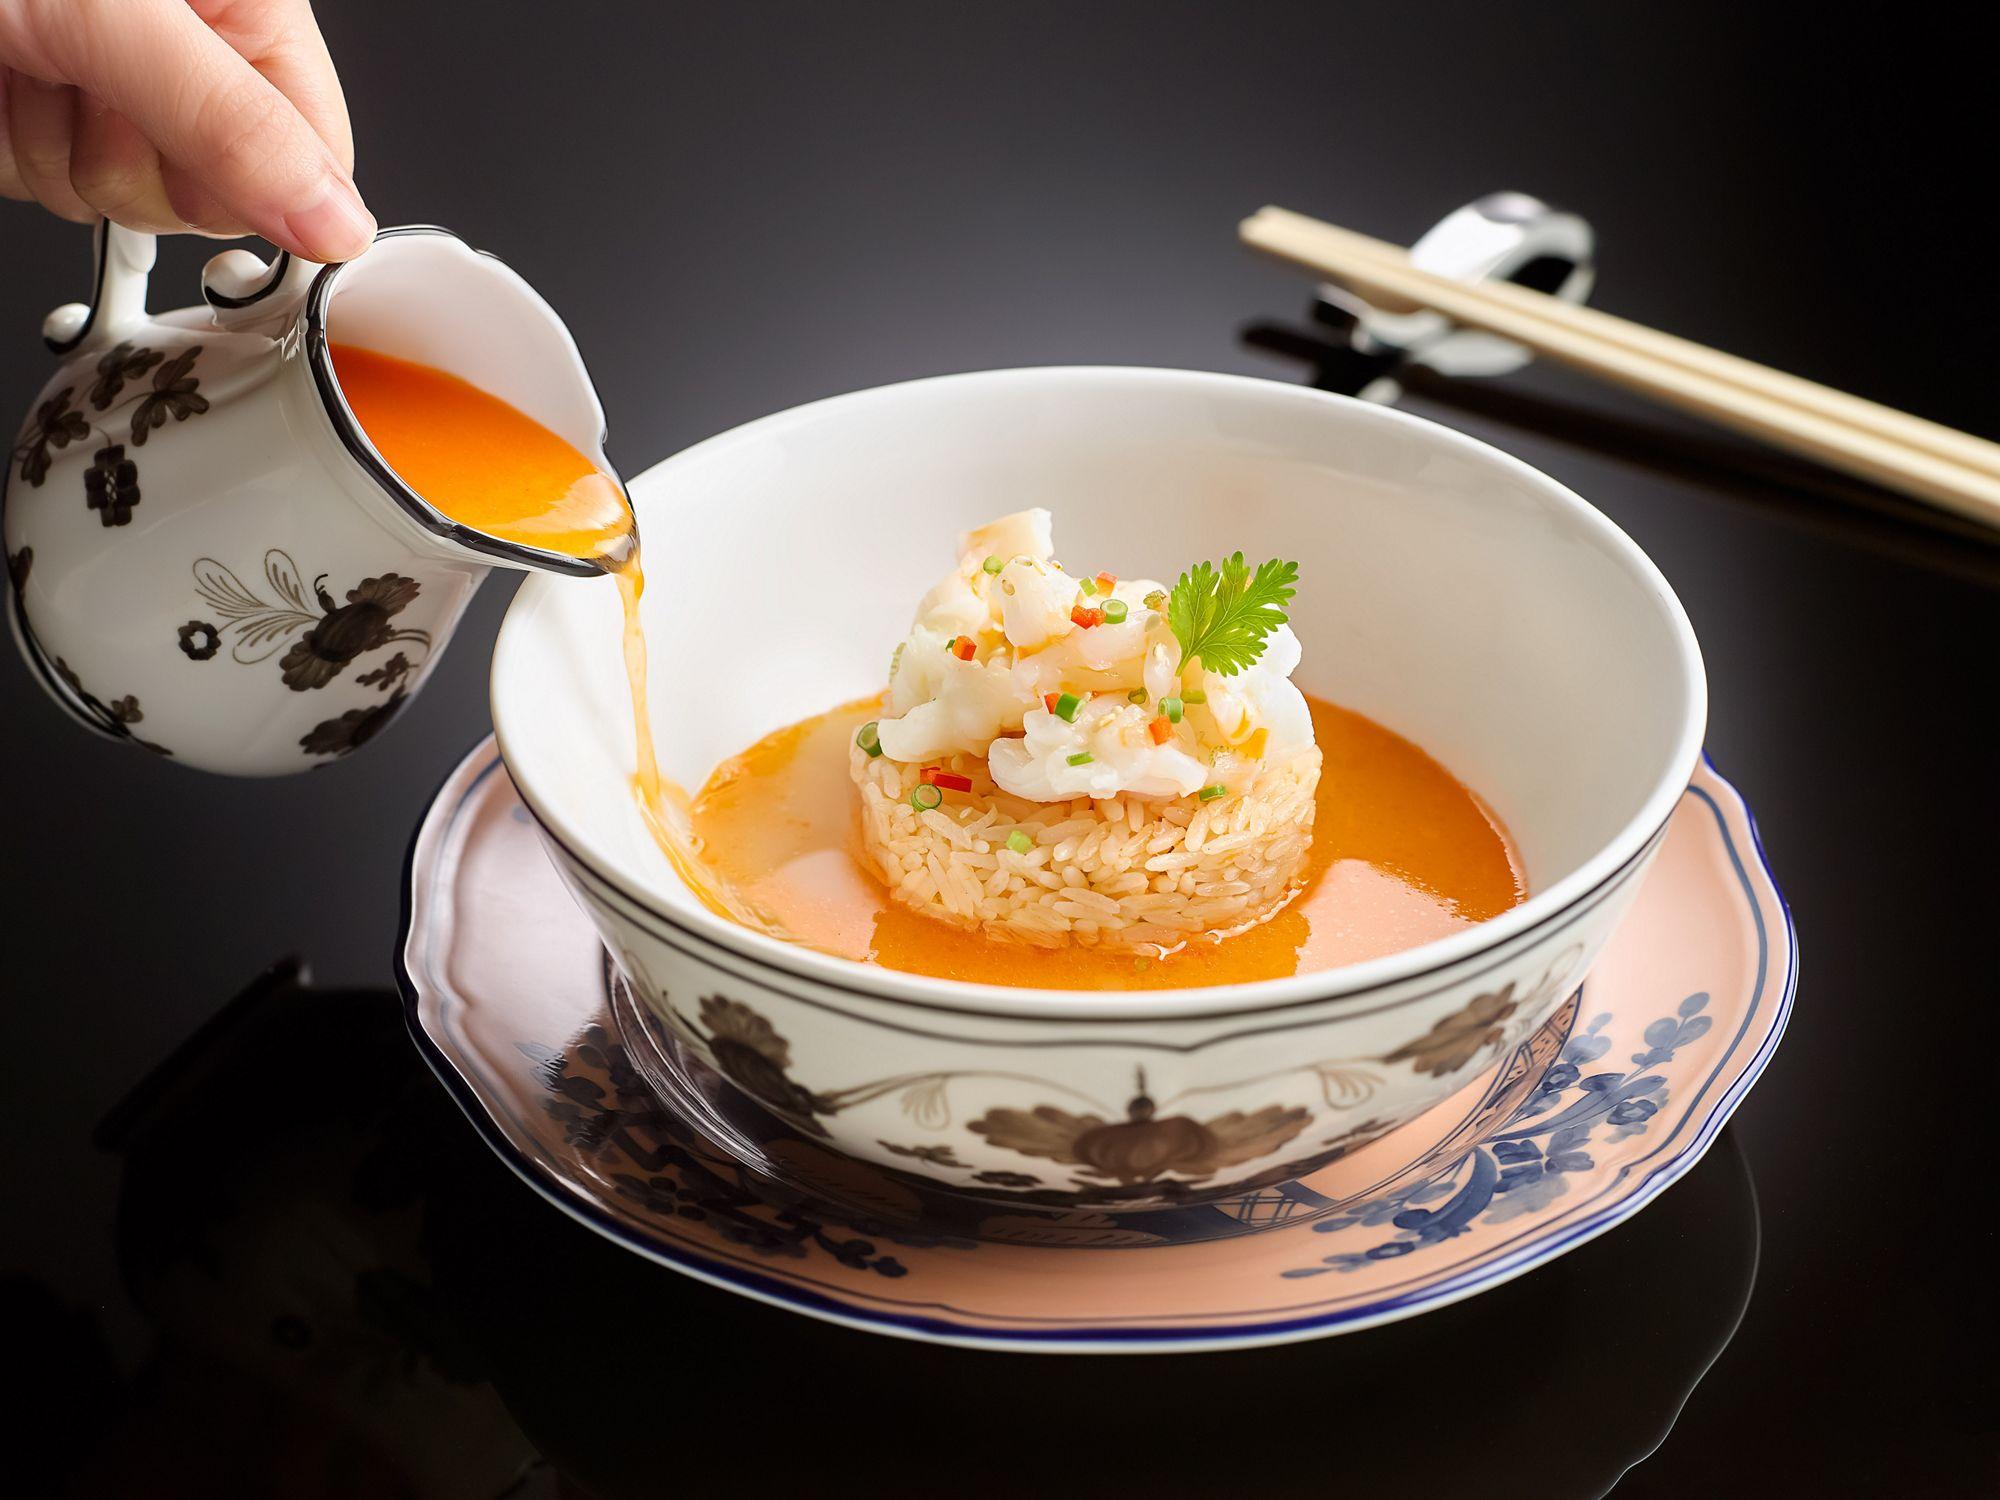 Chinese Restaurants Singapore - Michelin Star Restaurants